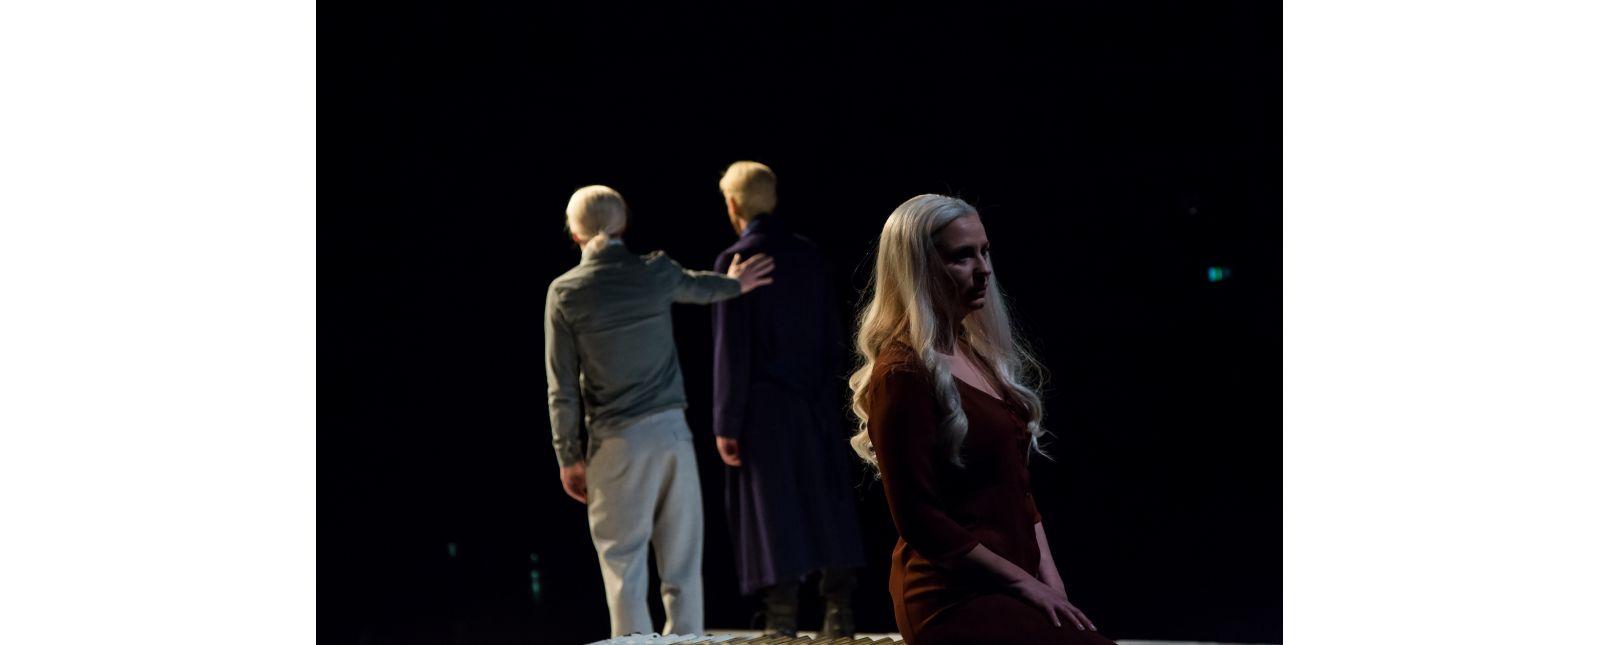 Totentanz // Martin Hohner, Victor Calero, Marieke Kregel // 2017 // Laura Nickel